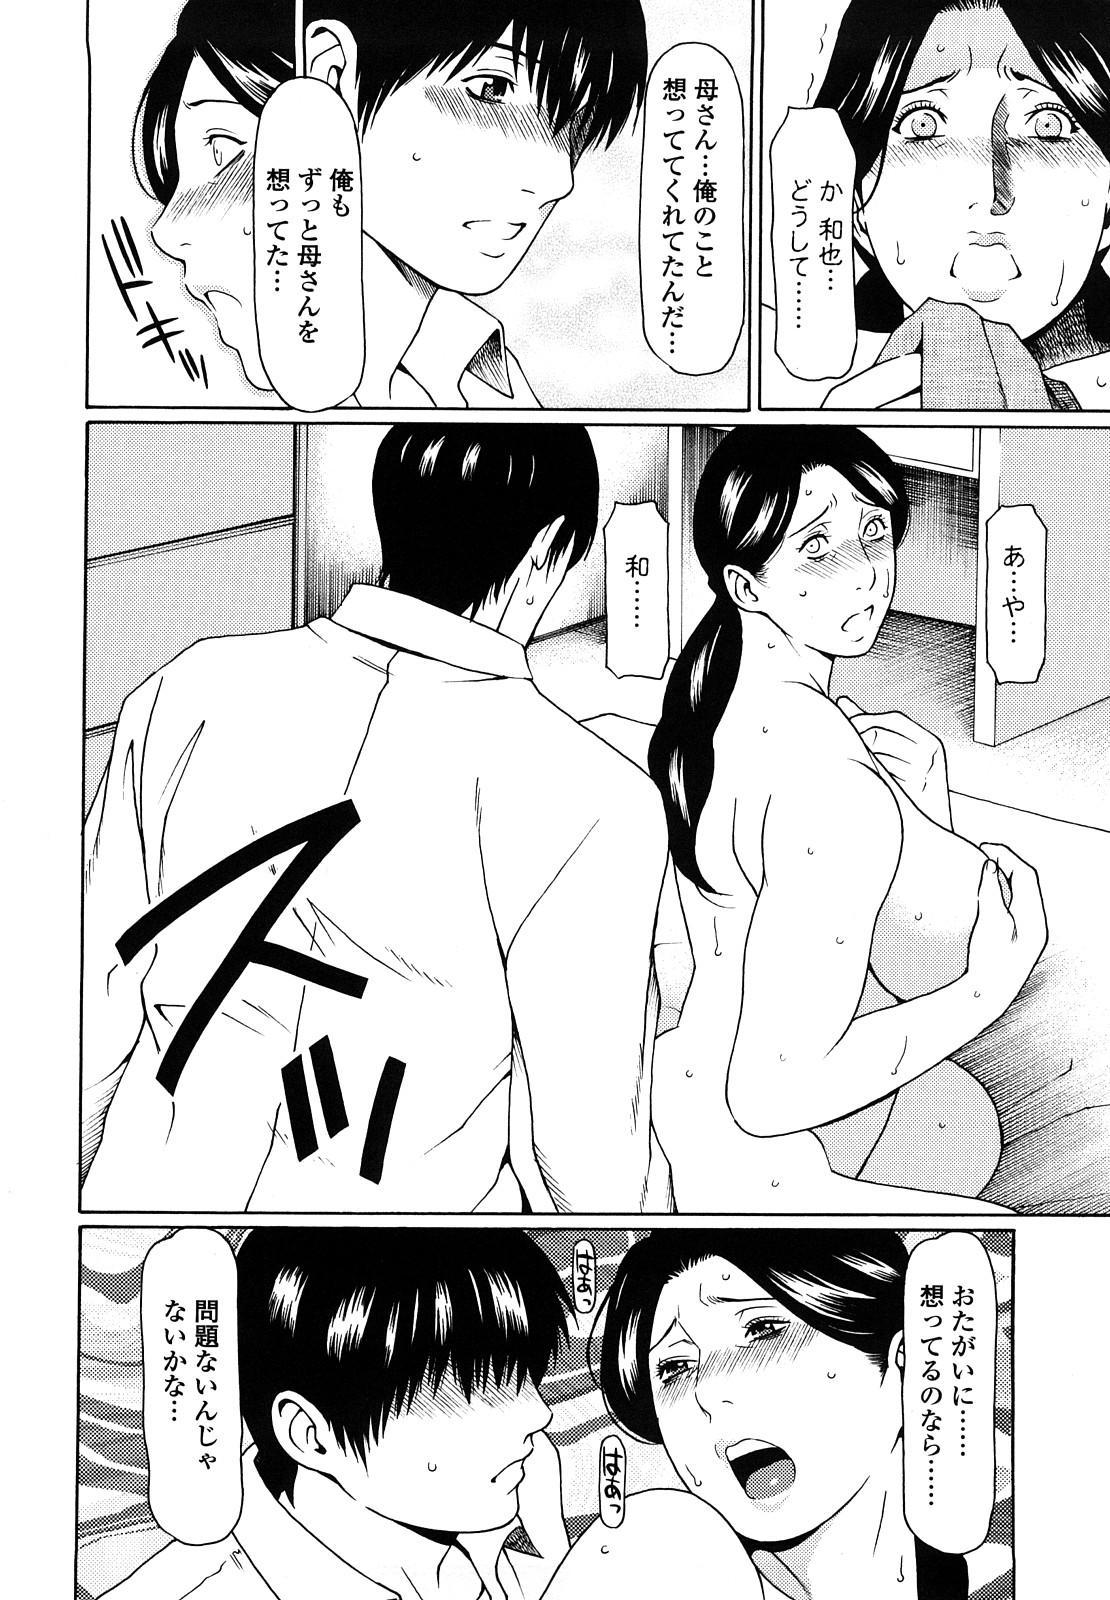 [Takasugi Kou] Kindan no Haha-Ana - Immorality Love-Hole [Decensored] 29